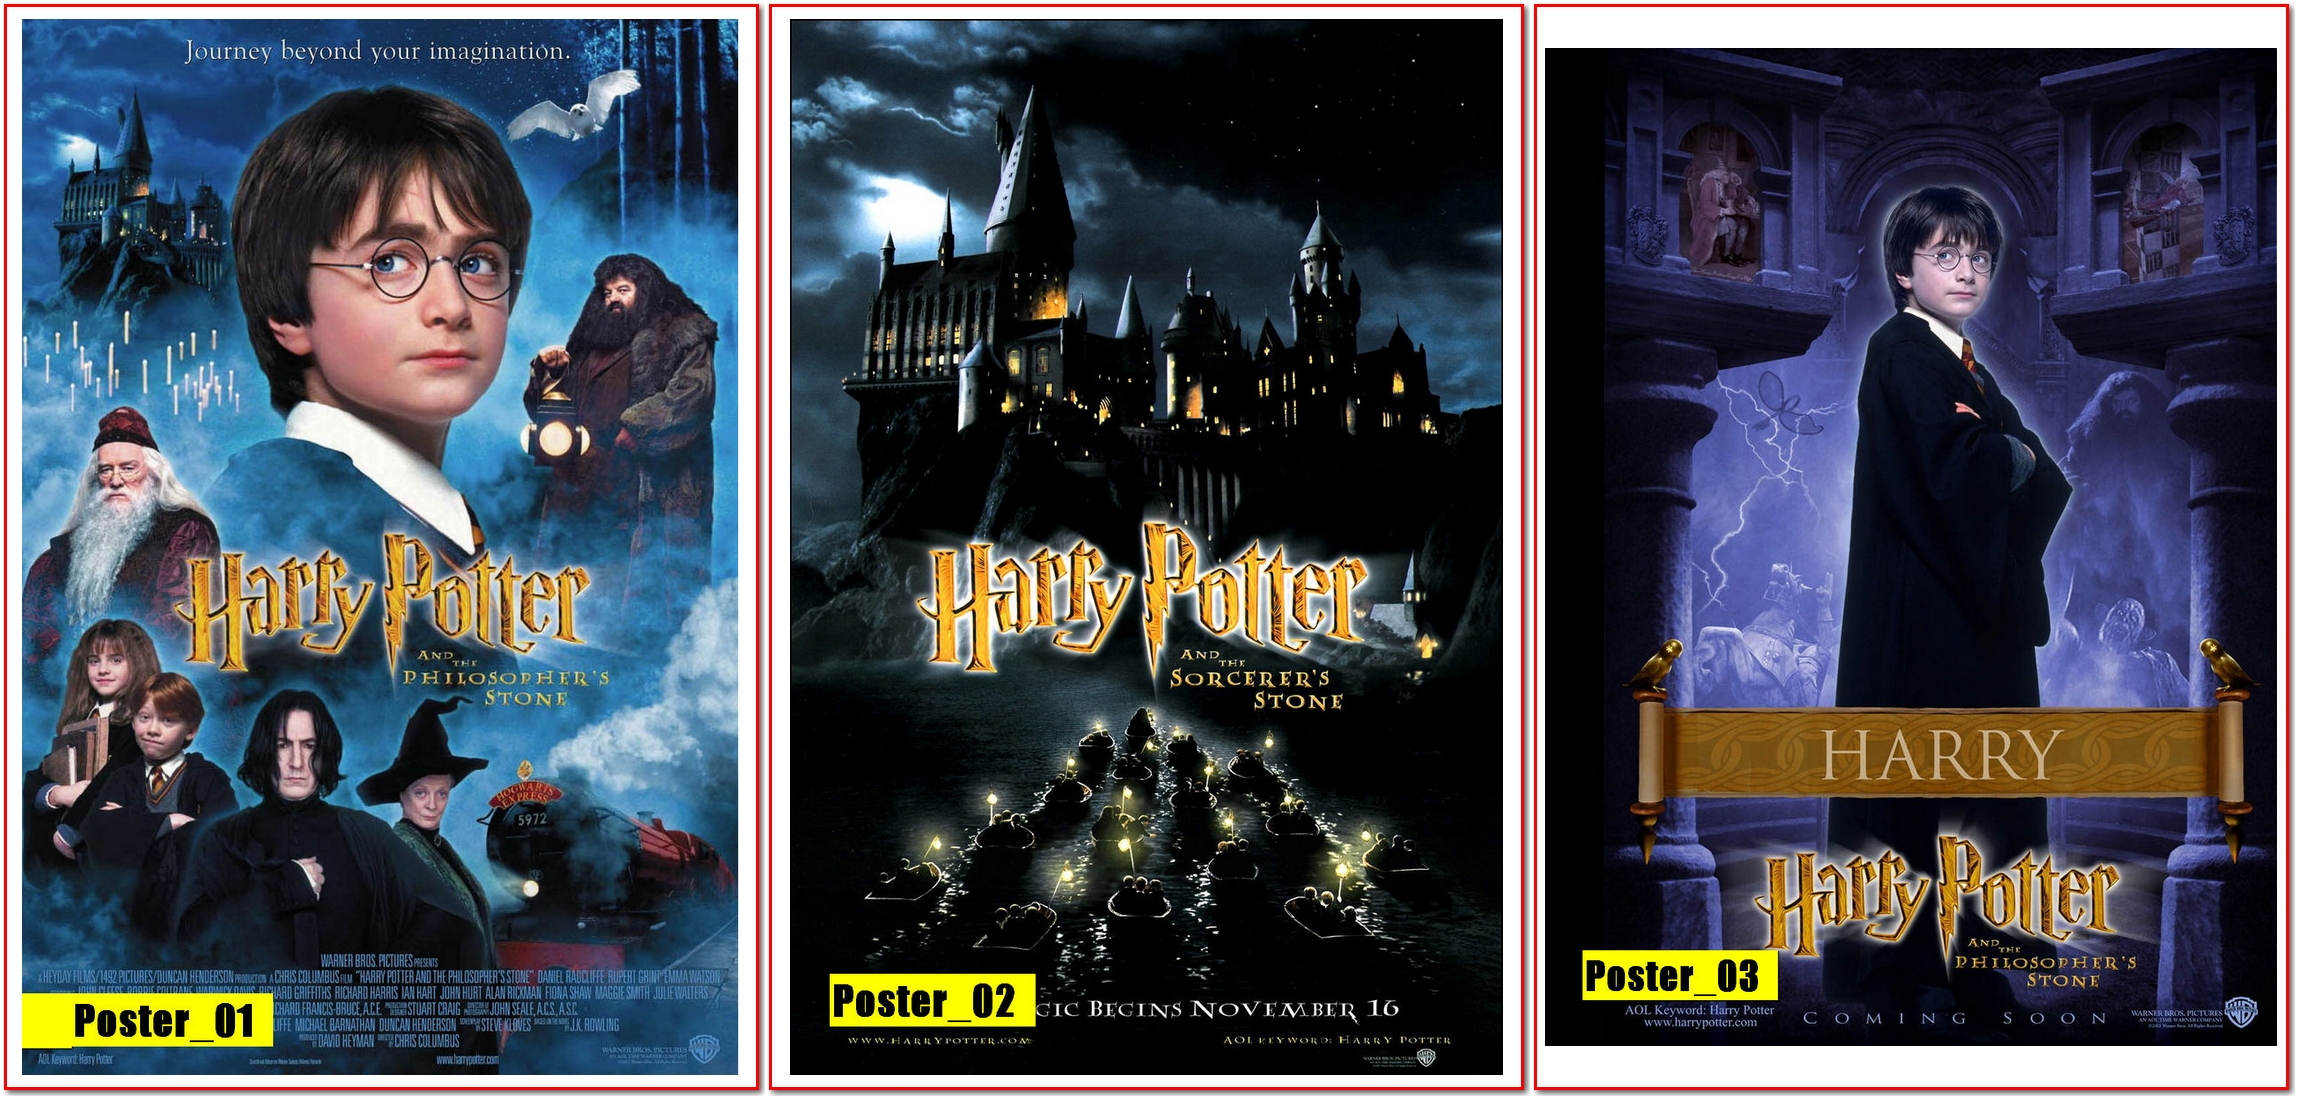 Harry Potter É A Pedra Filosofal regarding poster 30x40 - harrypedra filosofal   posterplus   elo7